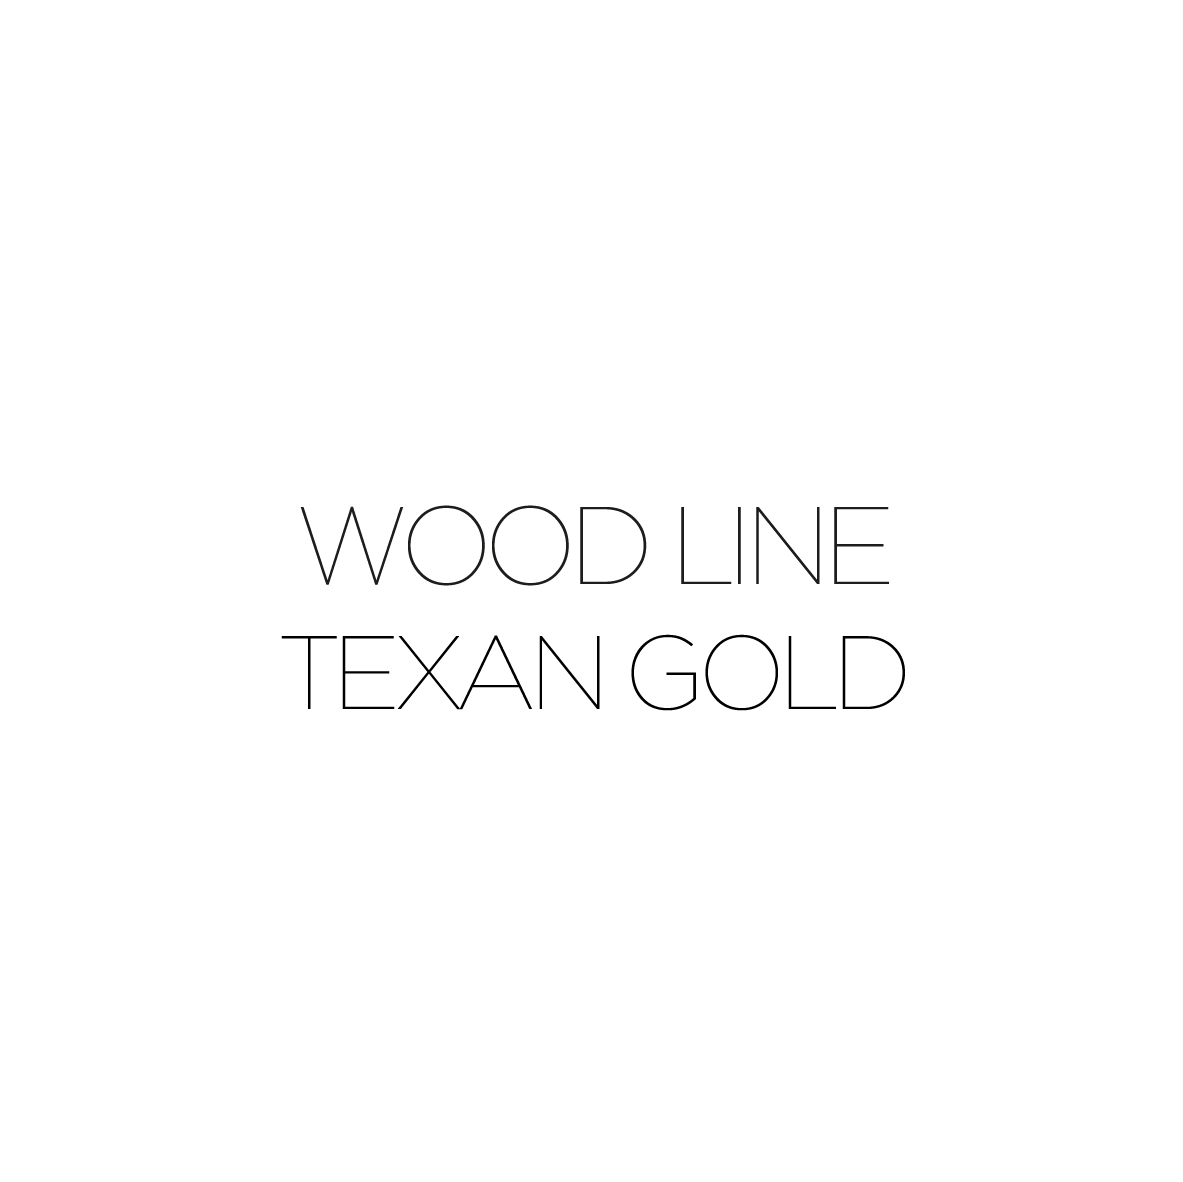 WOOD LINE TEXAN GOLD--07